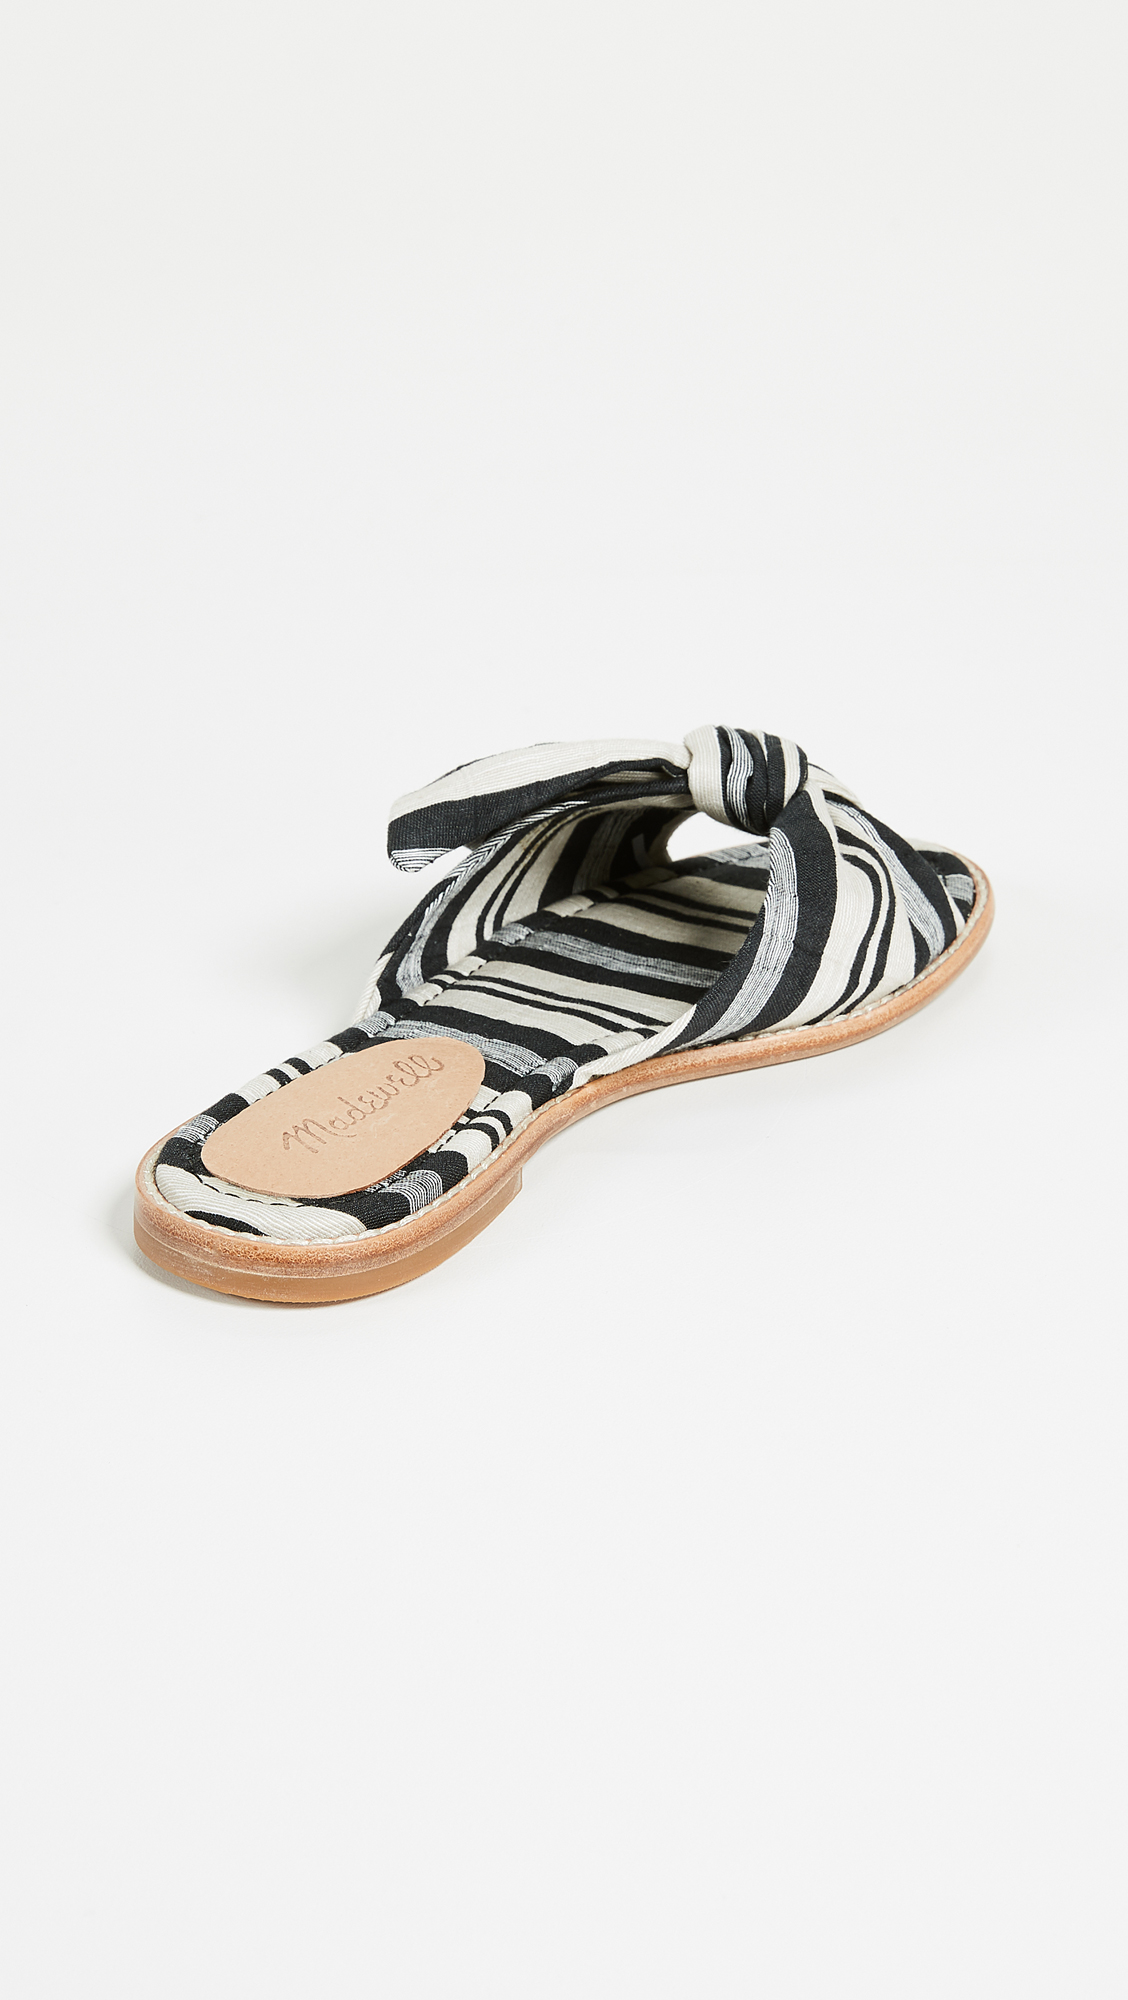 7e2b3c031f447 Madewell The Naida Half Bow Sandals